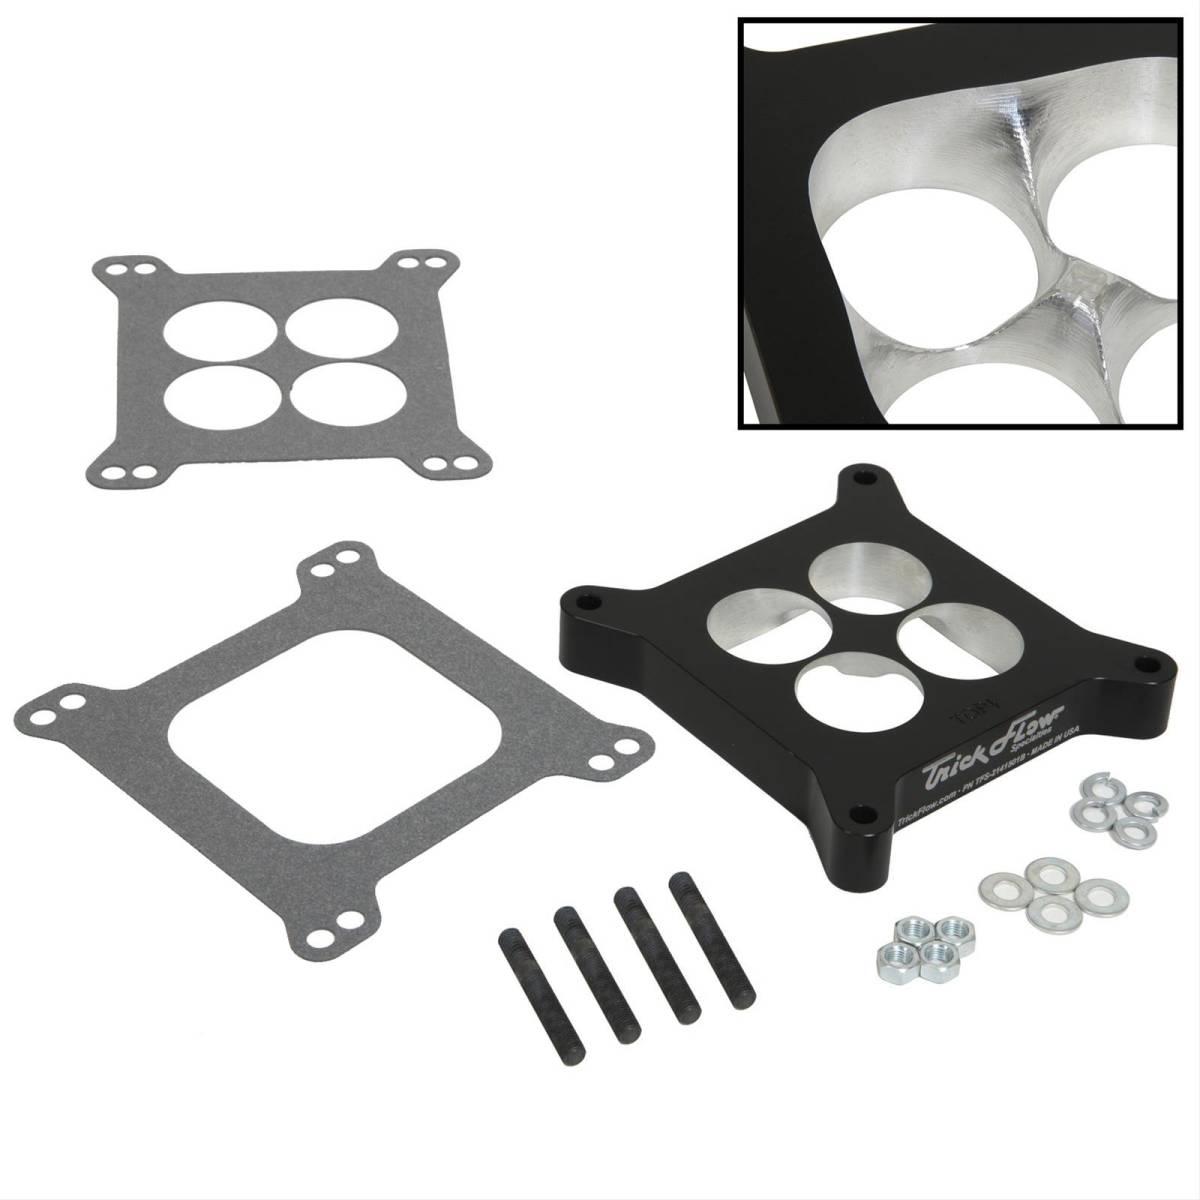 Trick Flow CNC Billet Aluminum Carburetor Spacers Kit 4150 4-Hole